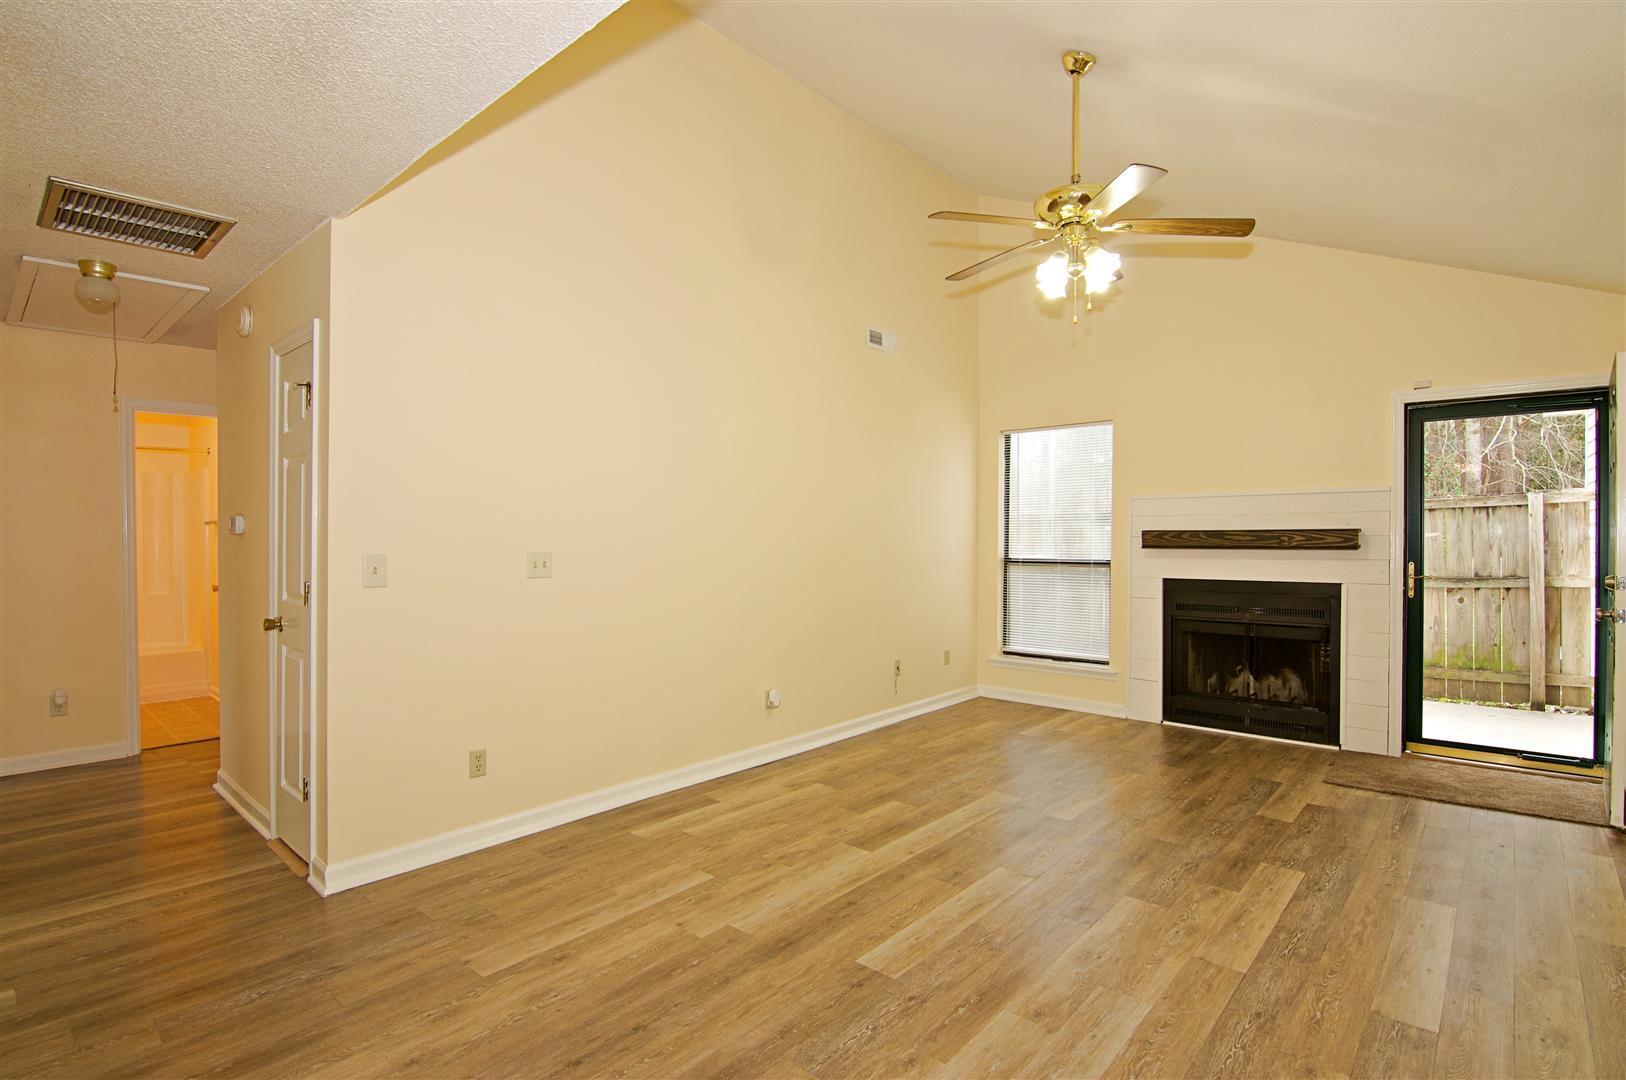 Shaftesbury Woods Homes For Sale - 931 Estates, Charleston, SC - 18